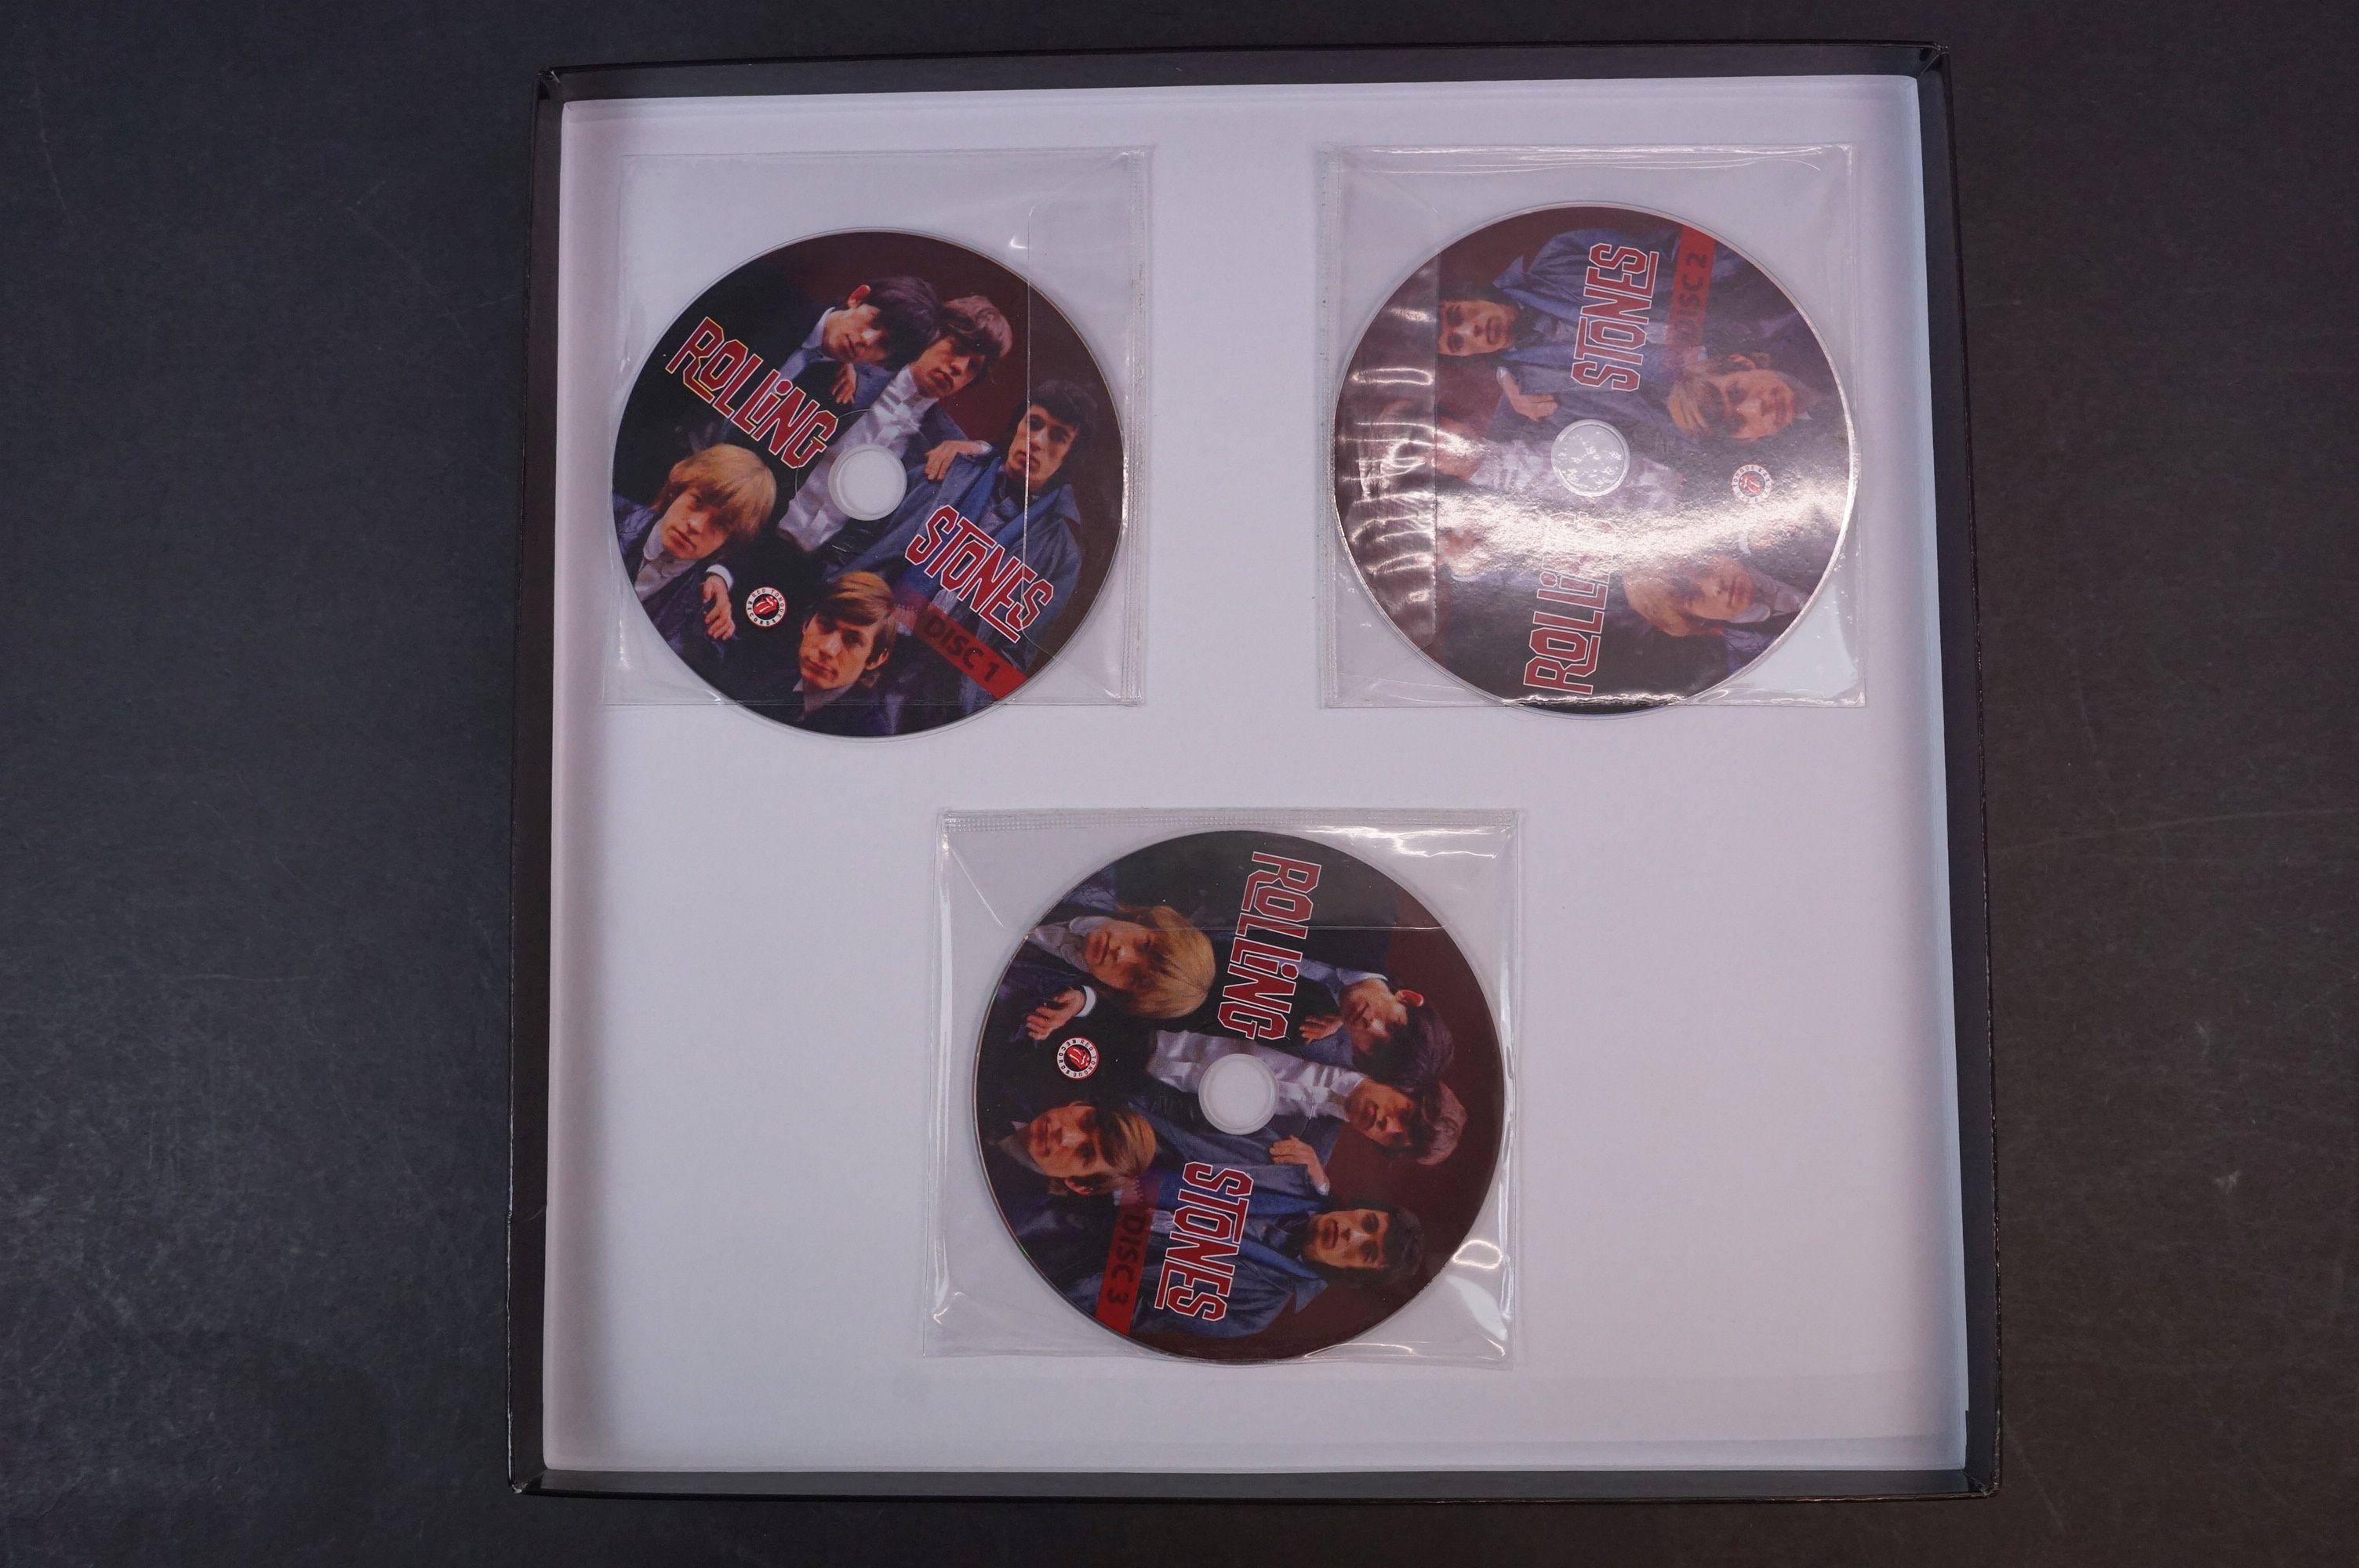 Vinyl - ltd edn The Rolling Stones The Brian Jones Years 5 LP / 3 CD Box Set RTR019, heavy - Image 2 of 12